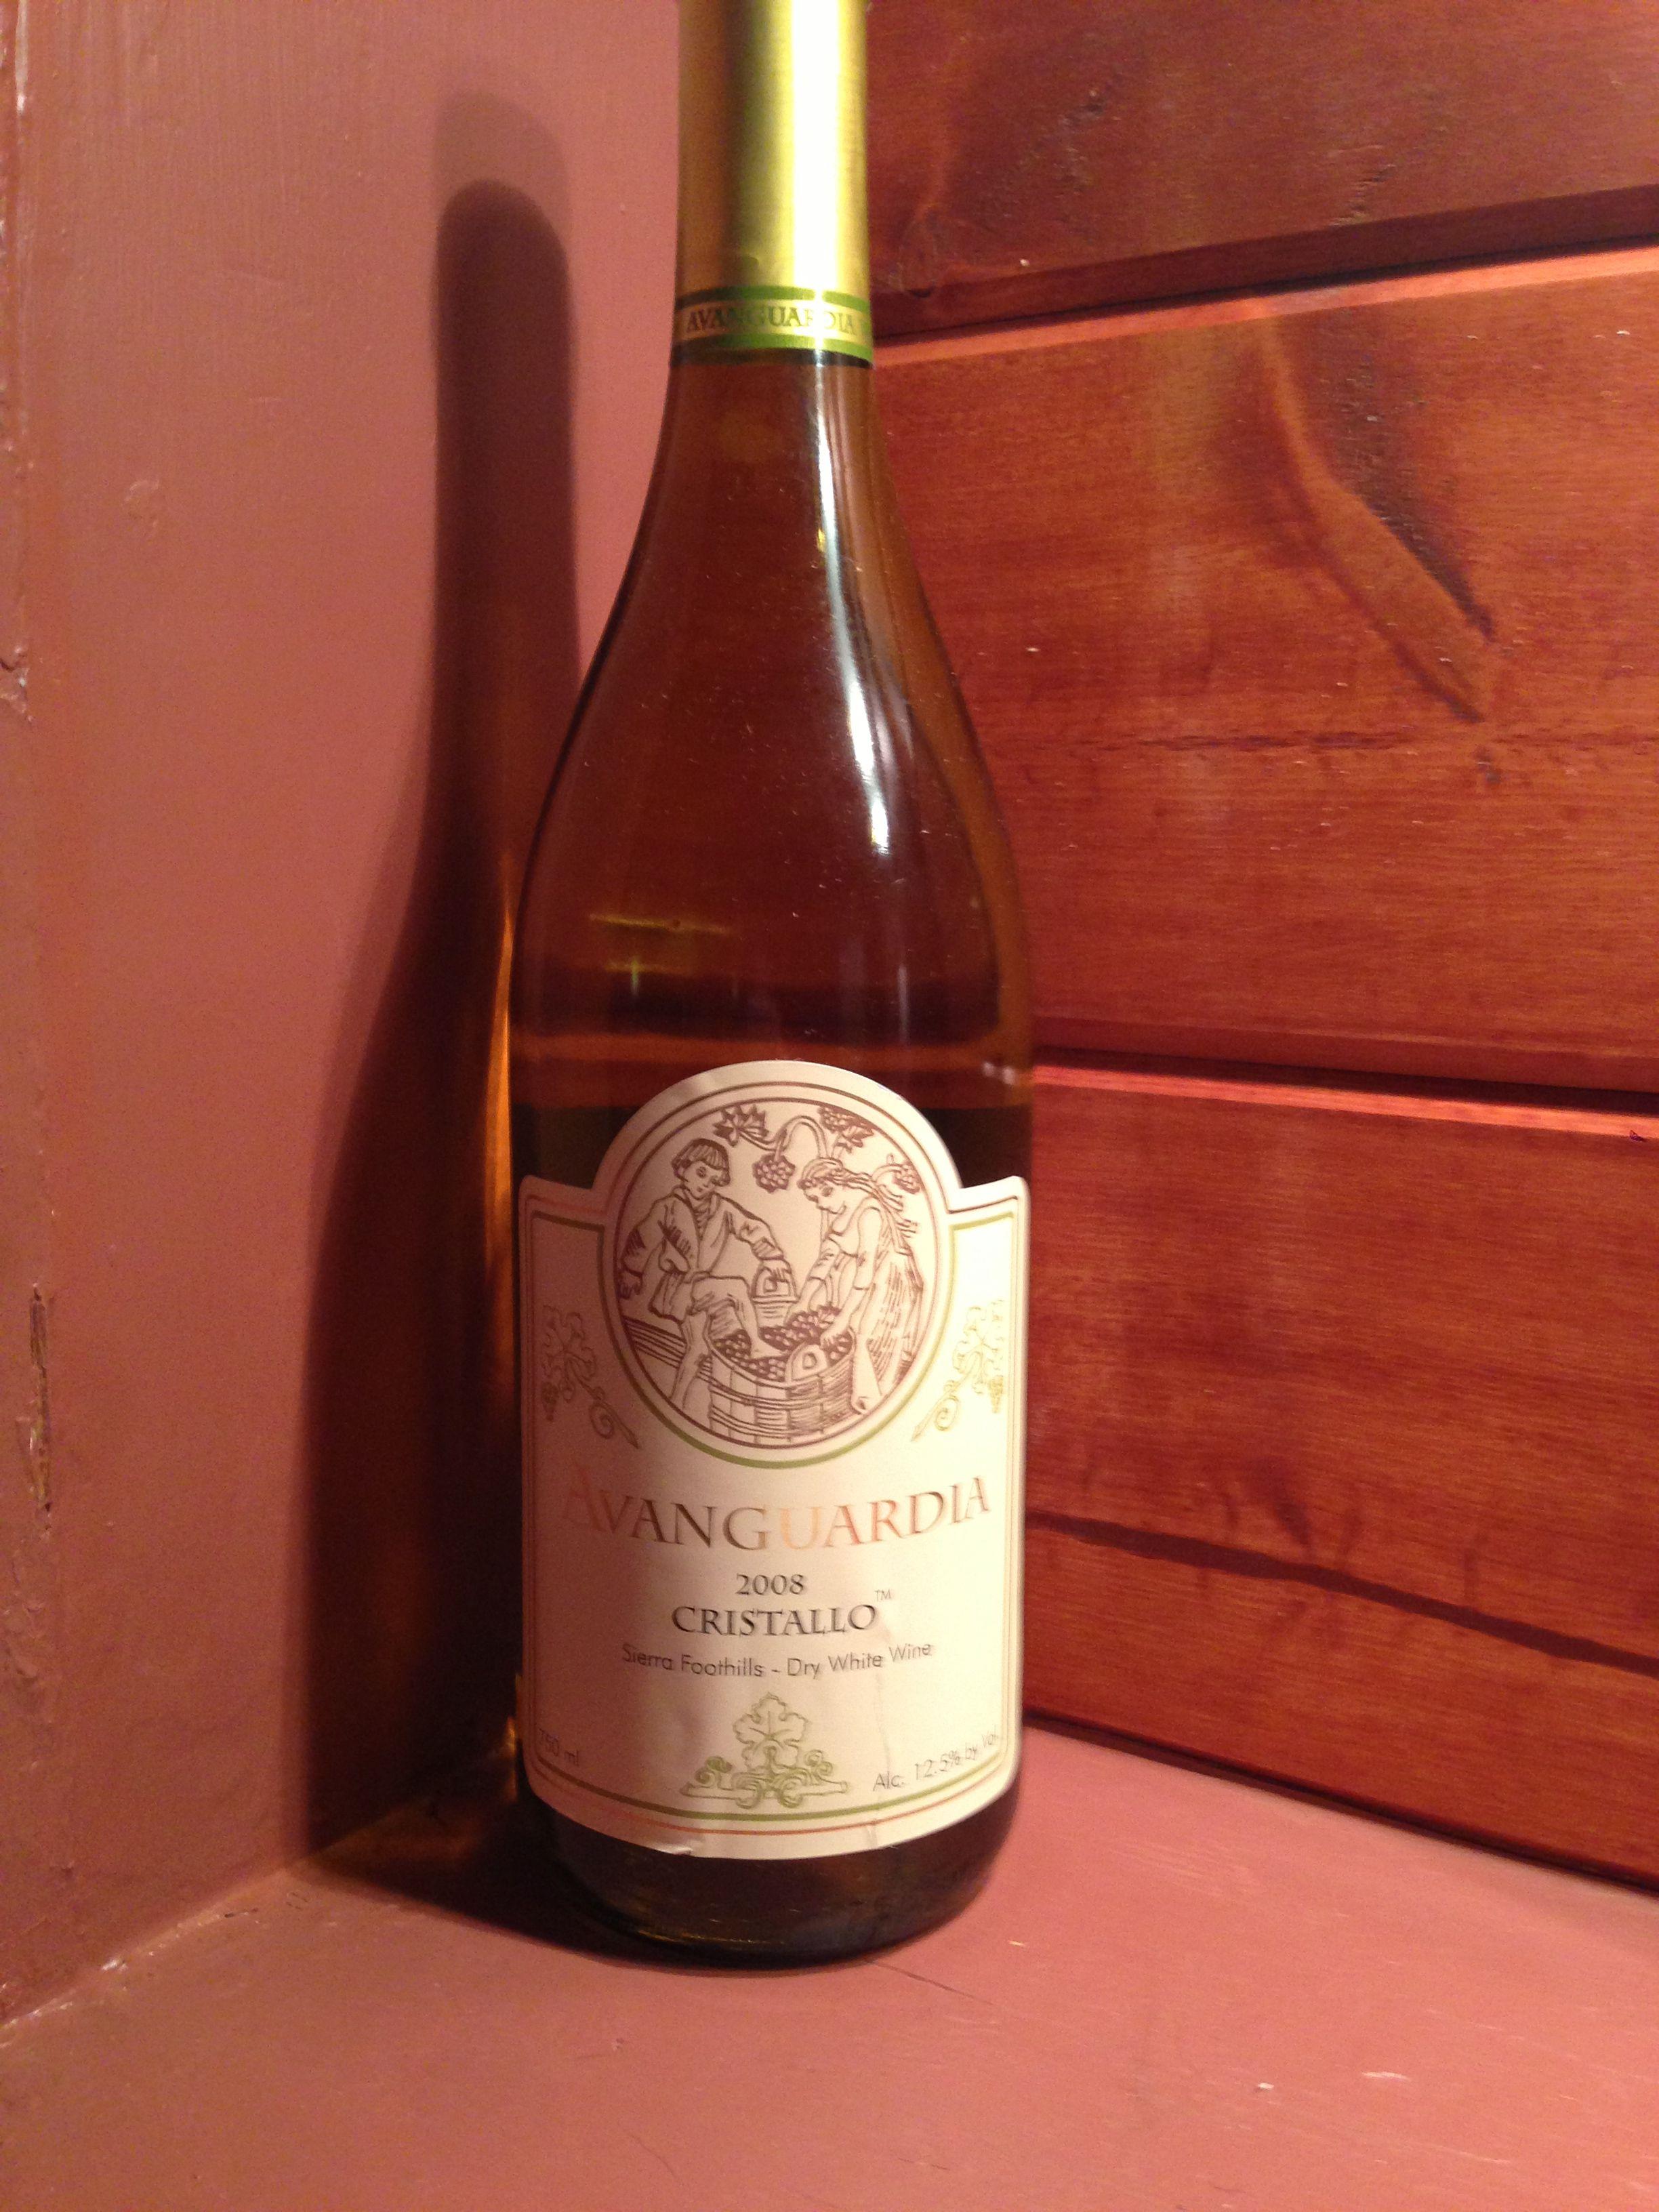 Avanguardia 14 Wine Bottle Wine Bottle